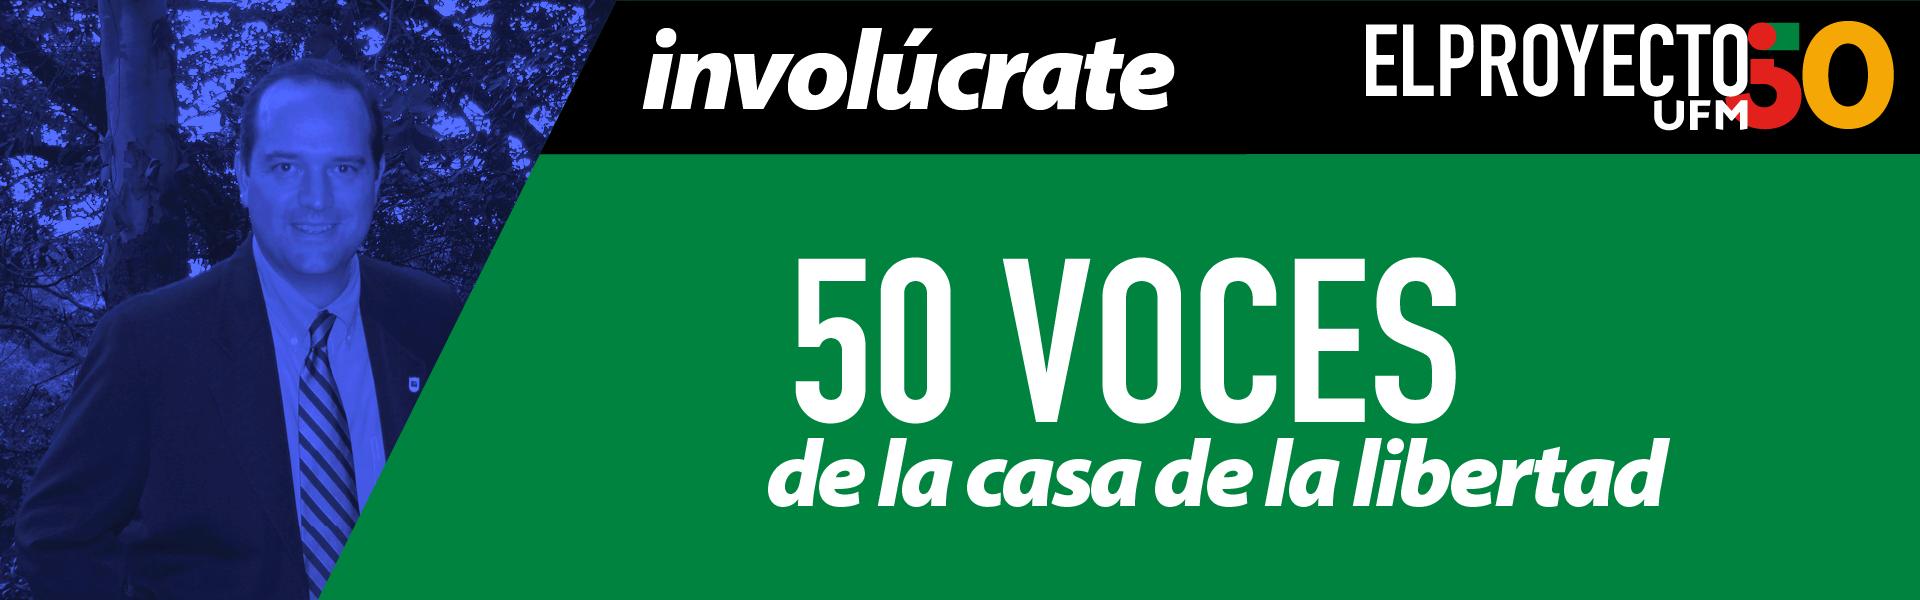 Proyecto 50 - 3